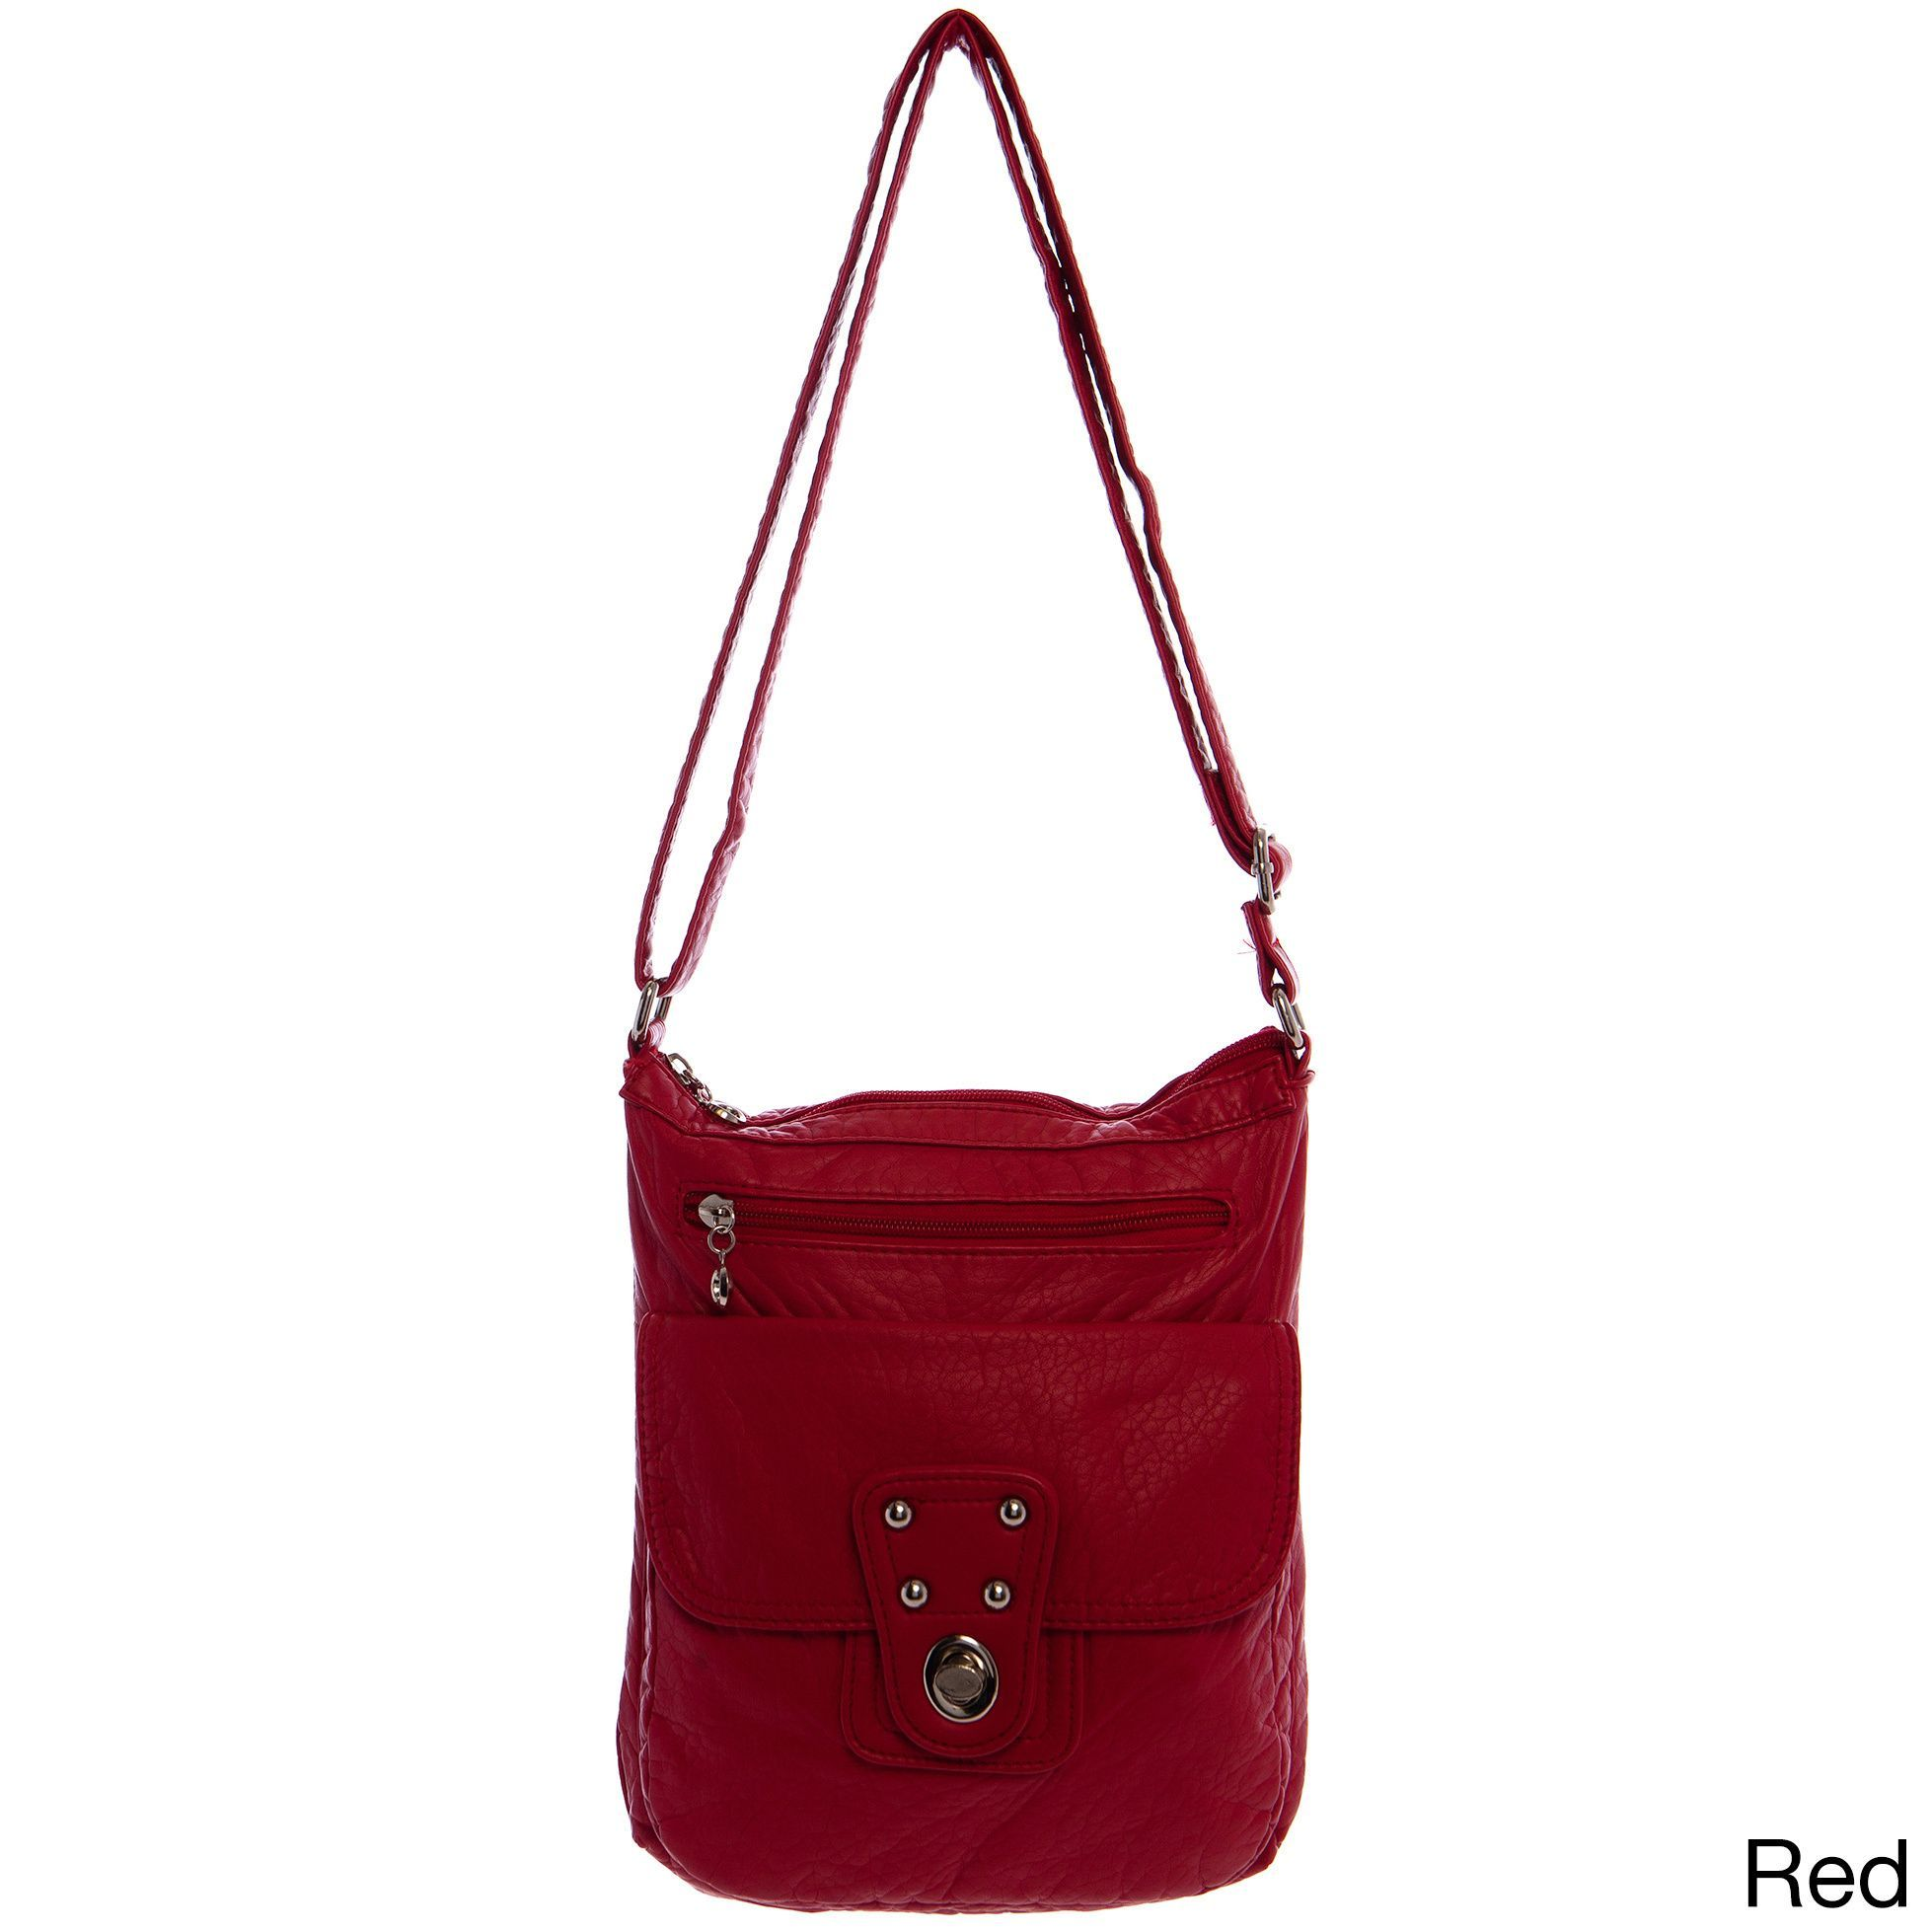 Stacy Vegan Extra-large Crossbody Handbag, Women's